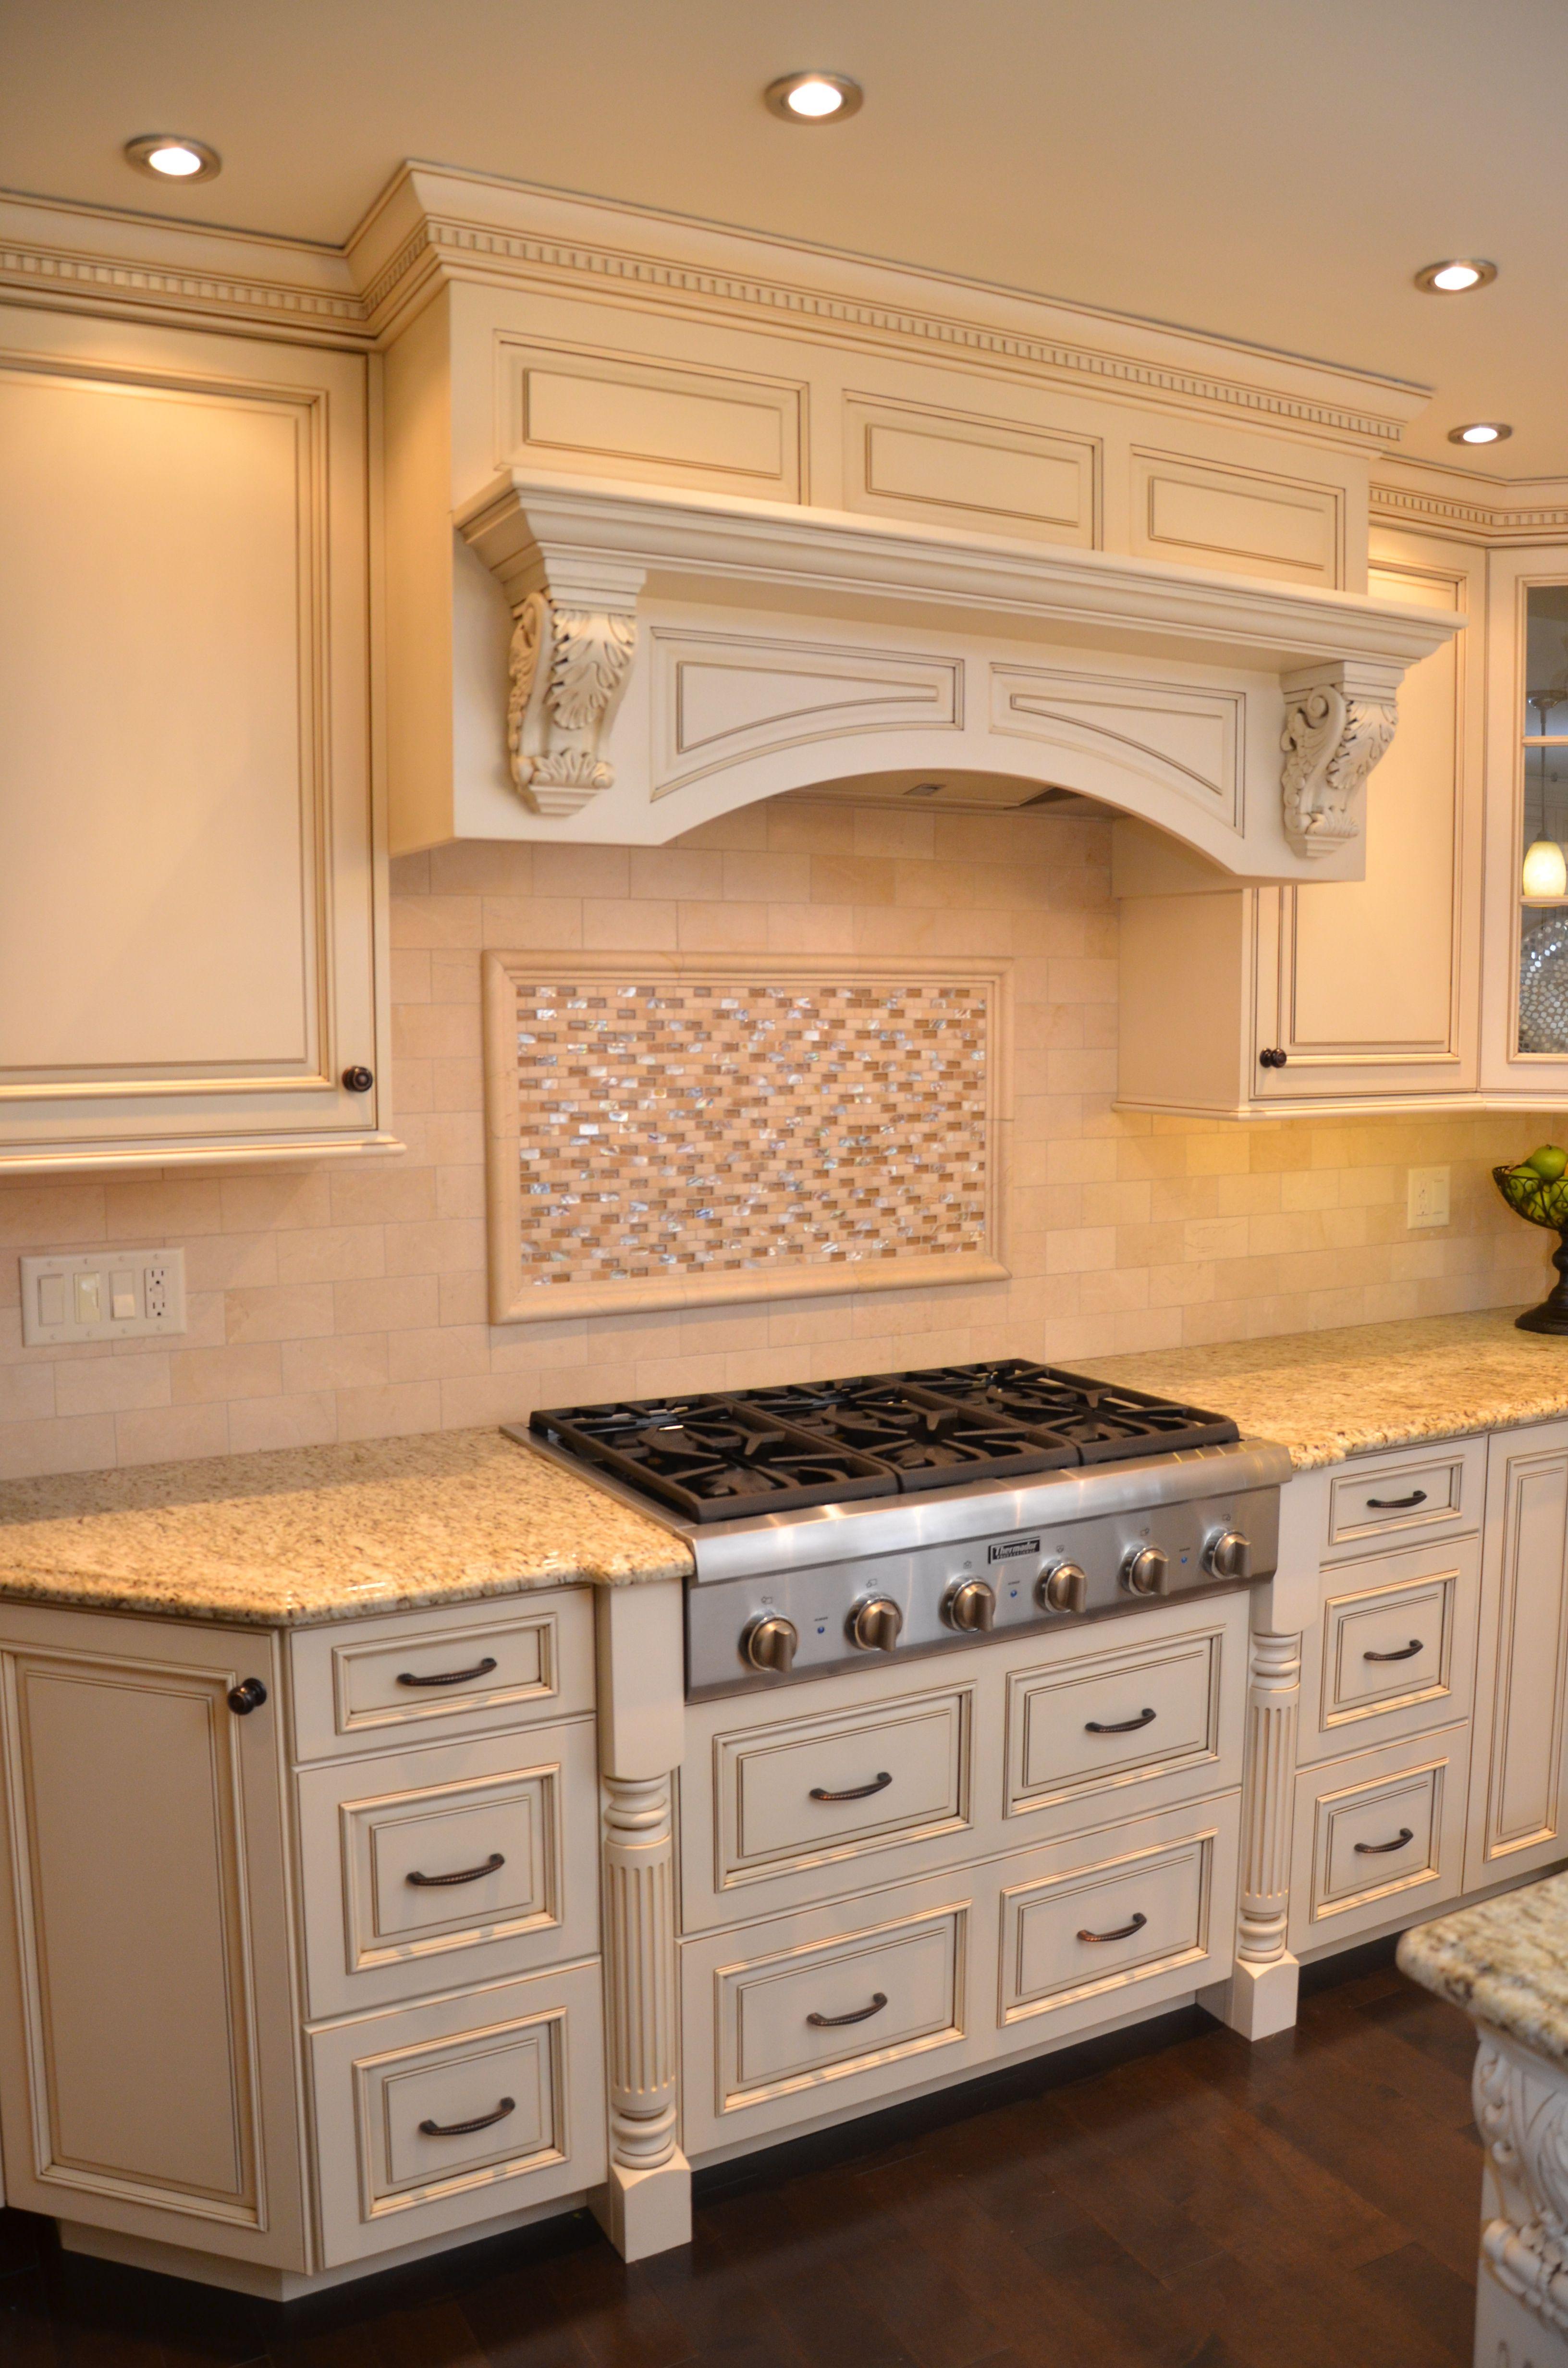 Decorative Glazed Cabinets In Marlboro Cabinet Decor Kitchen